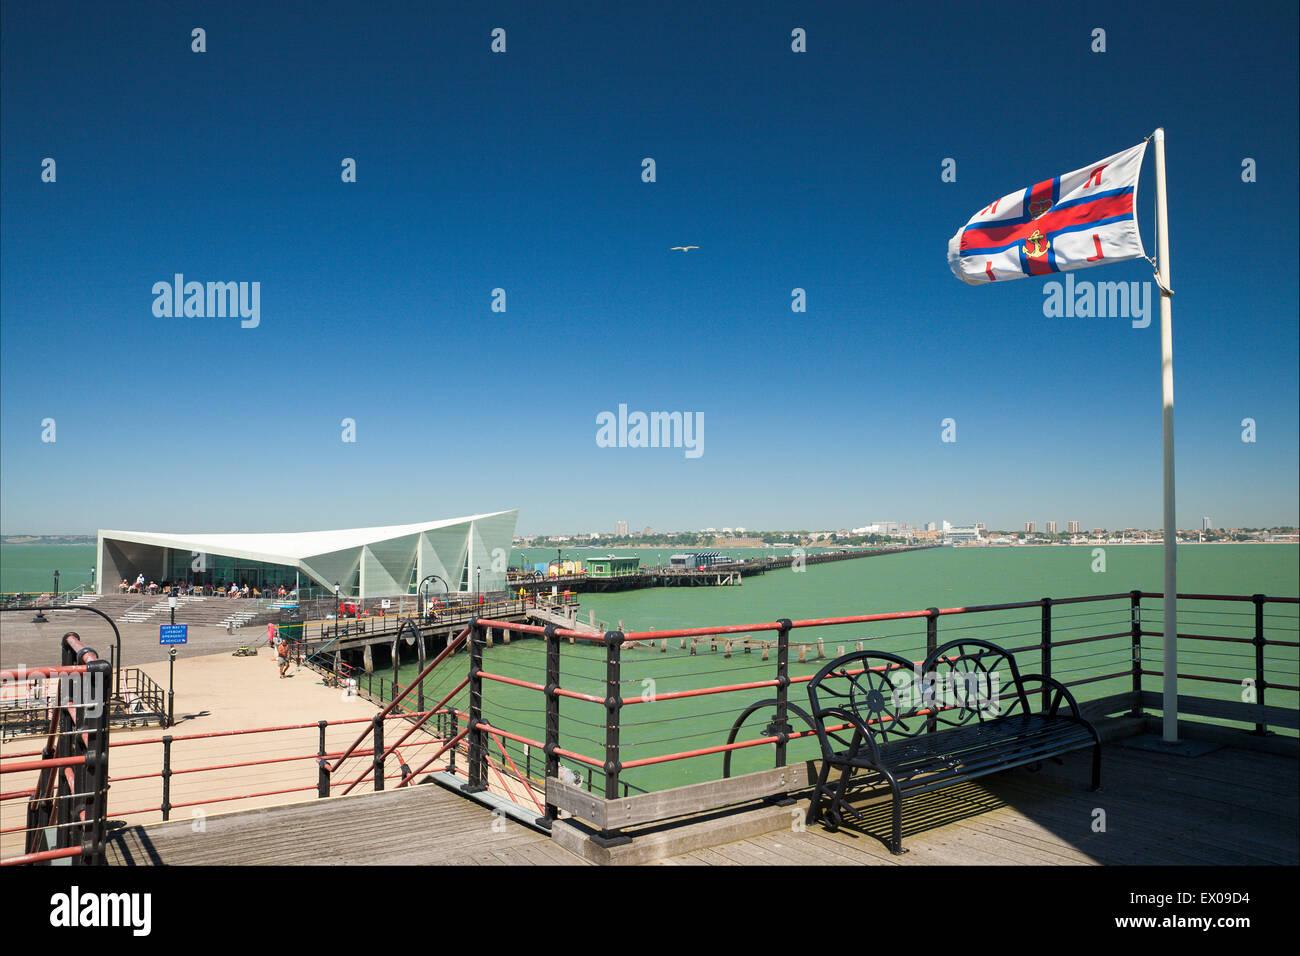 Southend Pier, Southend on Sea. - Stock Image